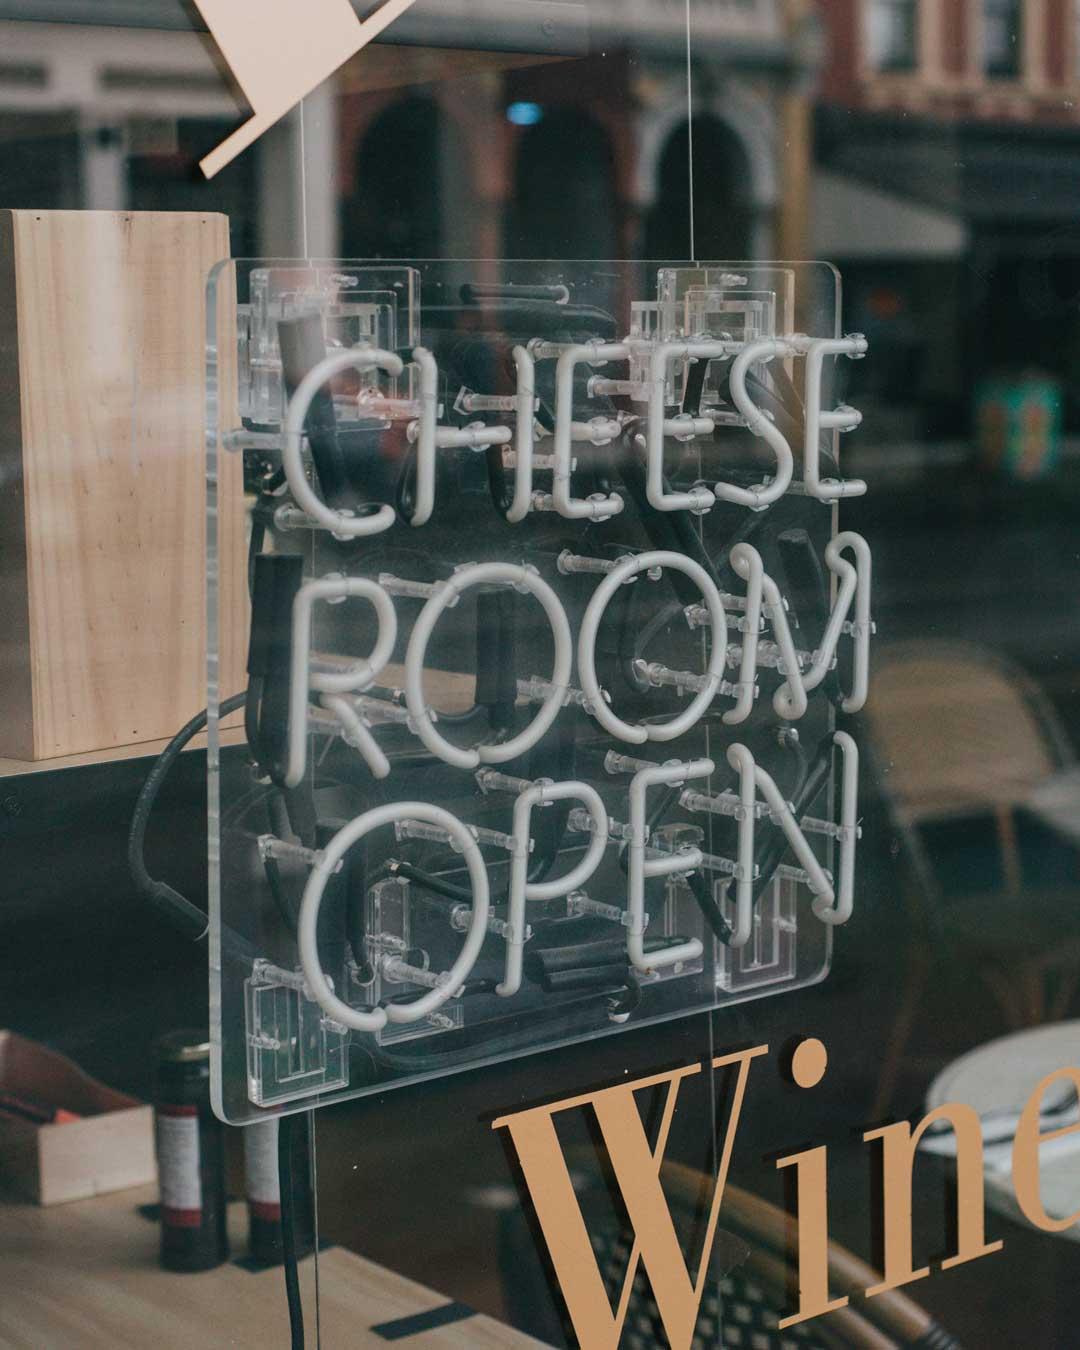 richmond-hill-cafe-closure